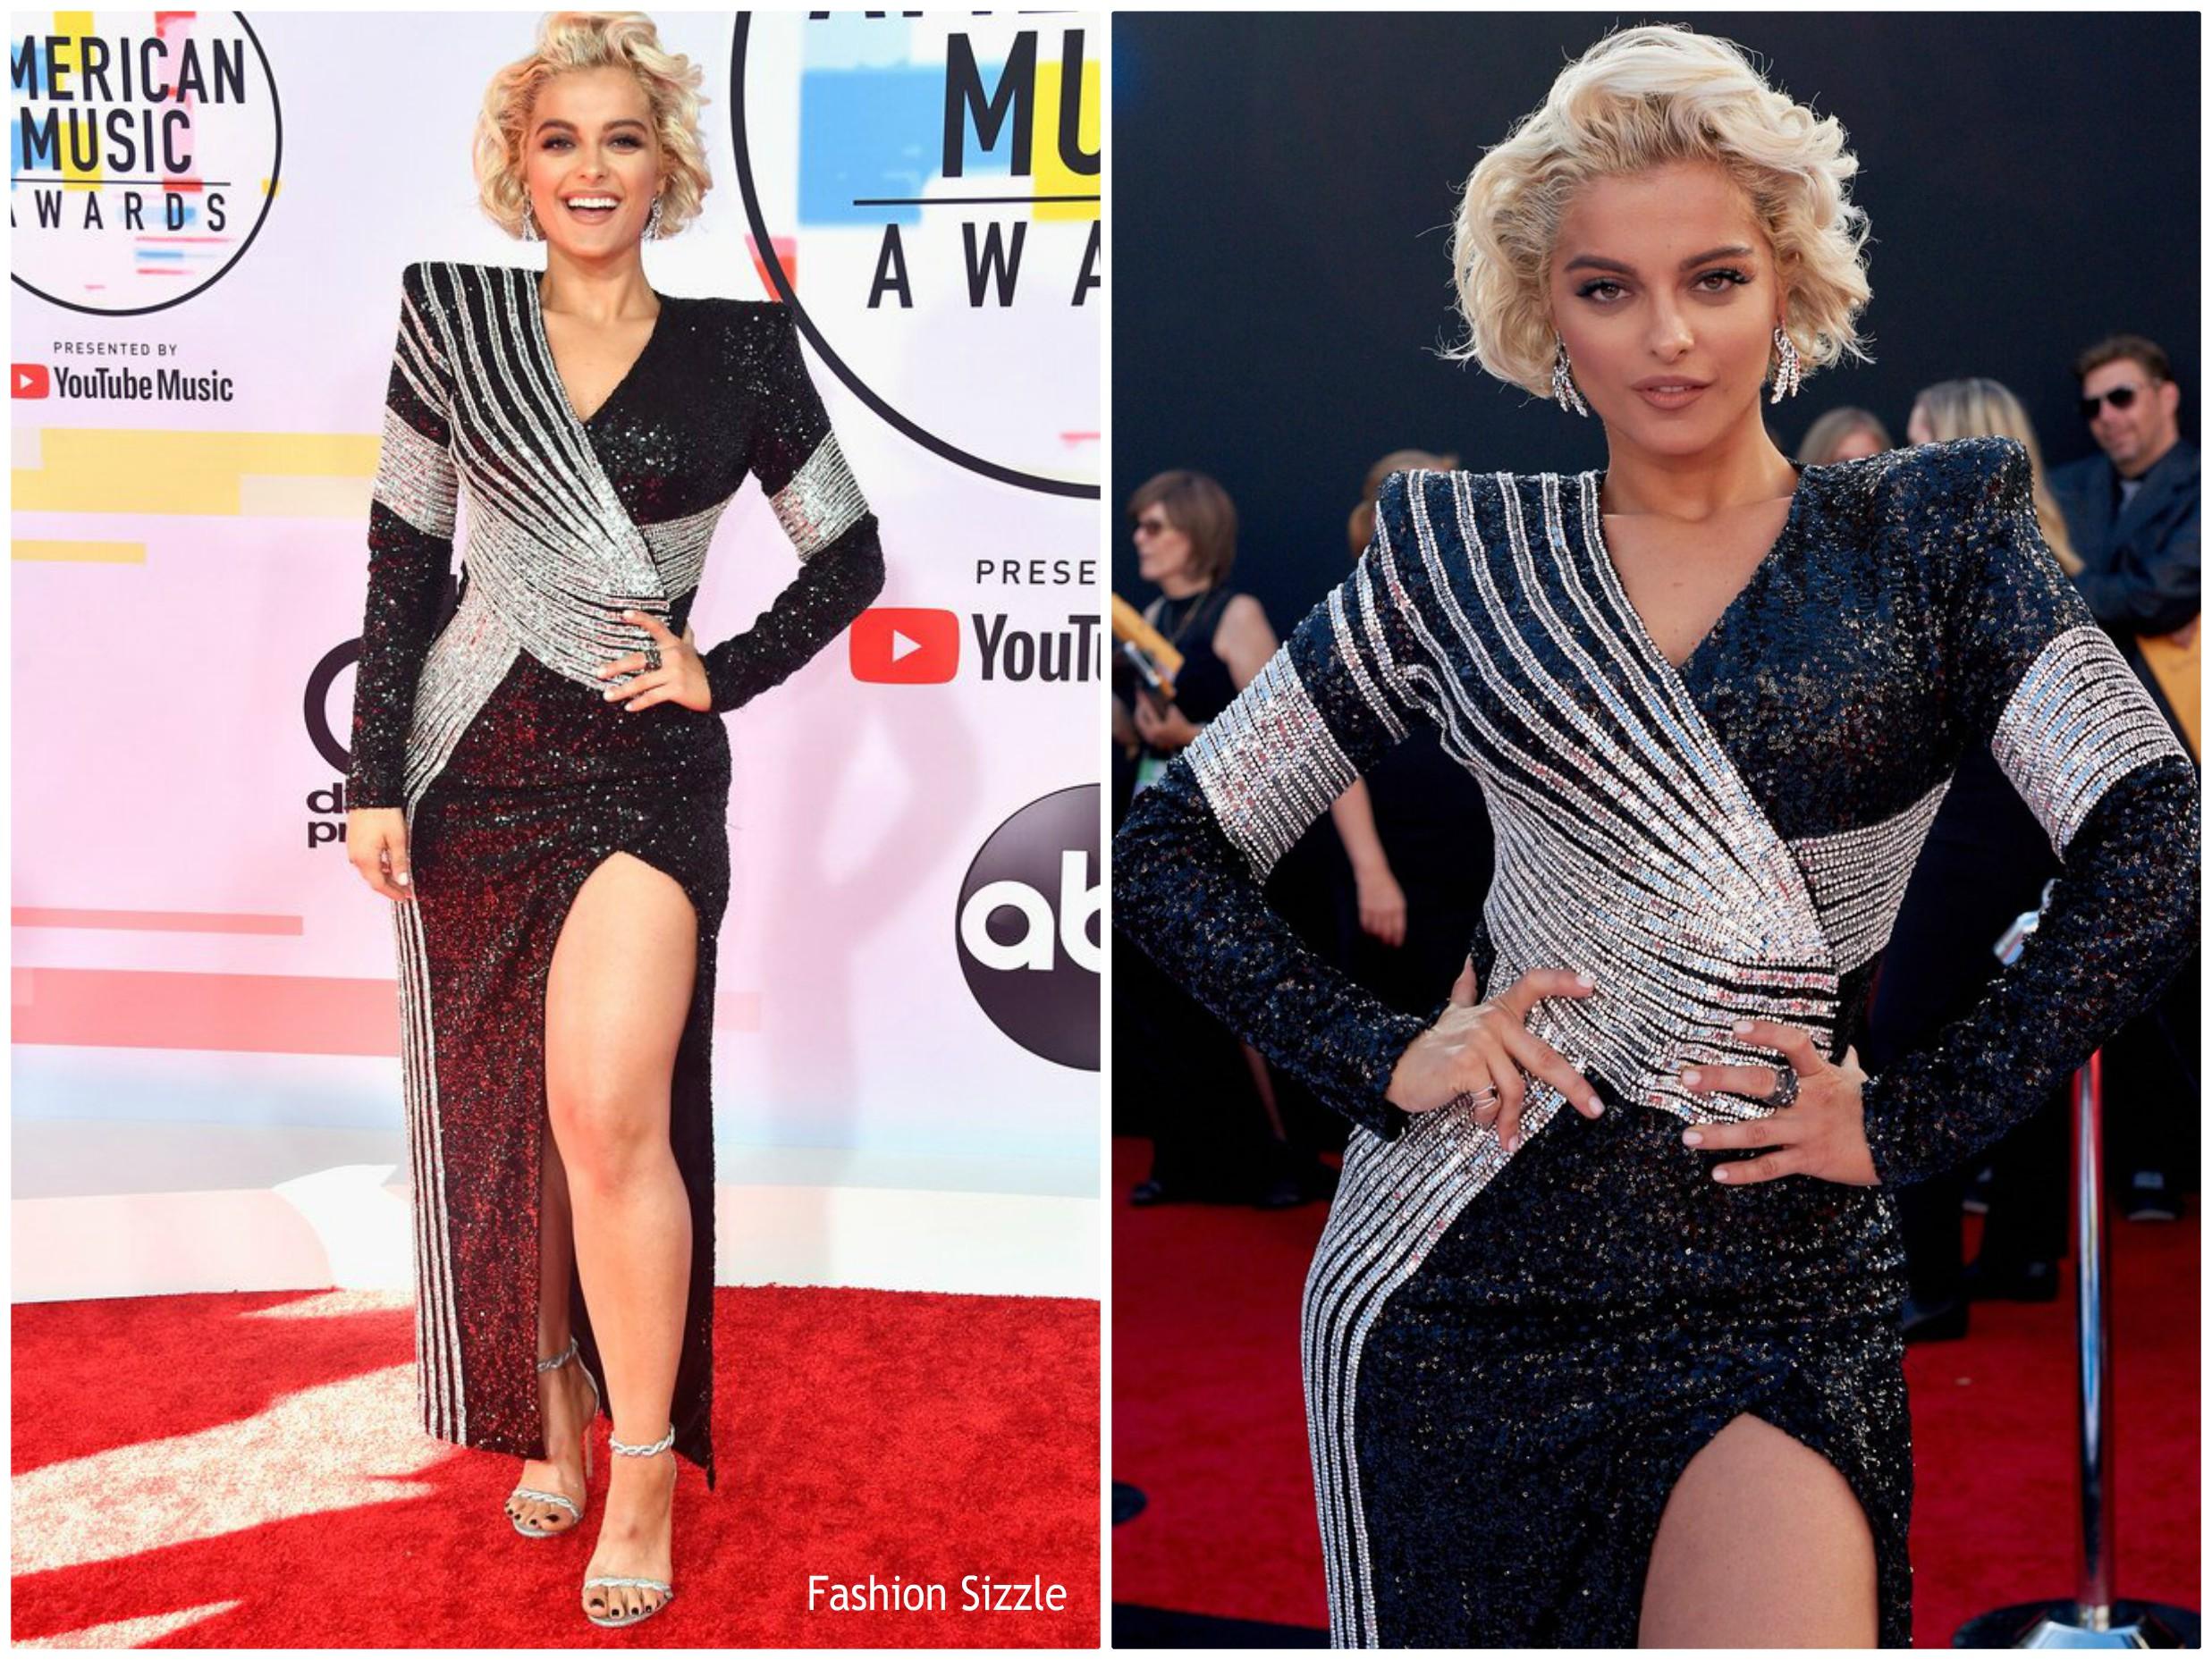 57bc273e Bebe Rexha In Balmain @ 2018 American Music Awards - Fashionsizzle